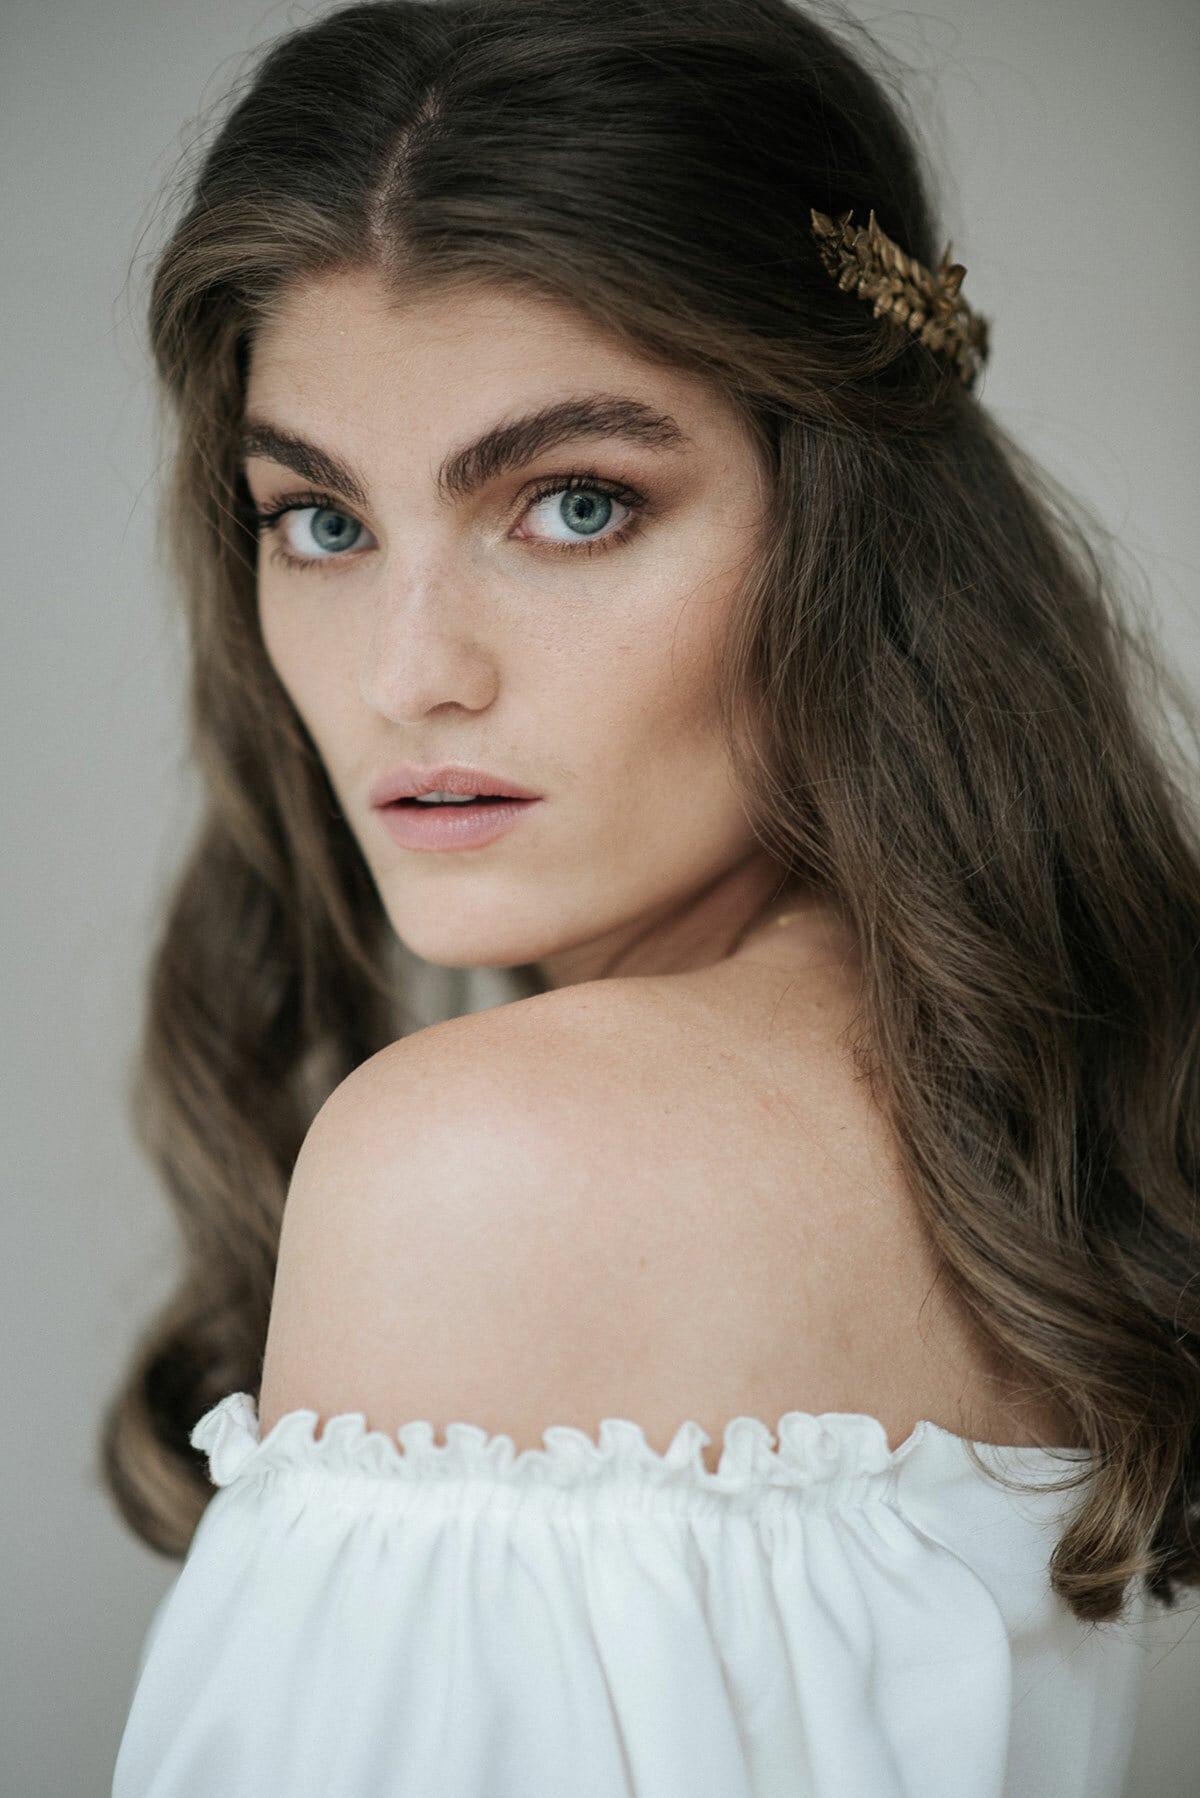 bruidskapsel-kapsel-headpiece-haar-haaraccessorire